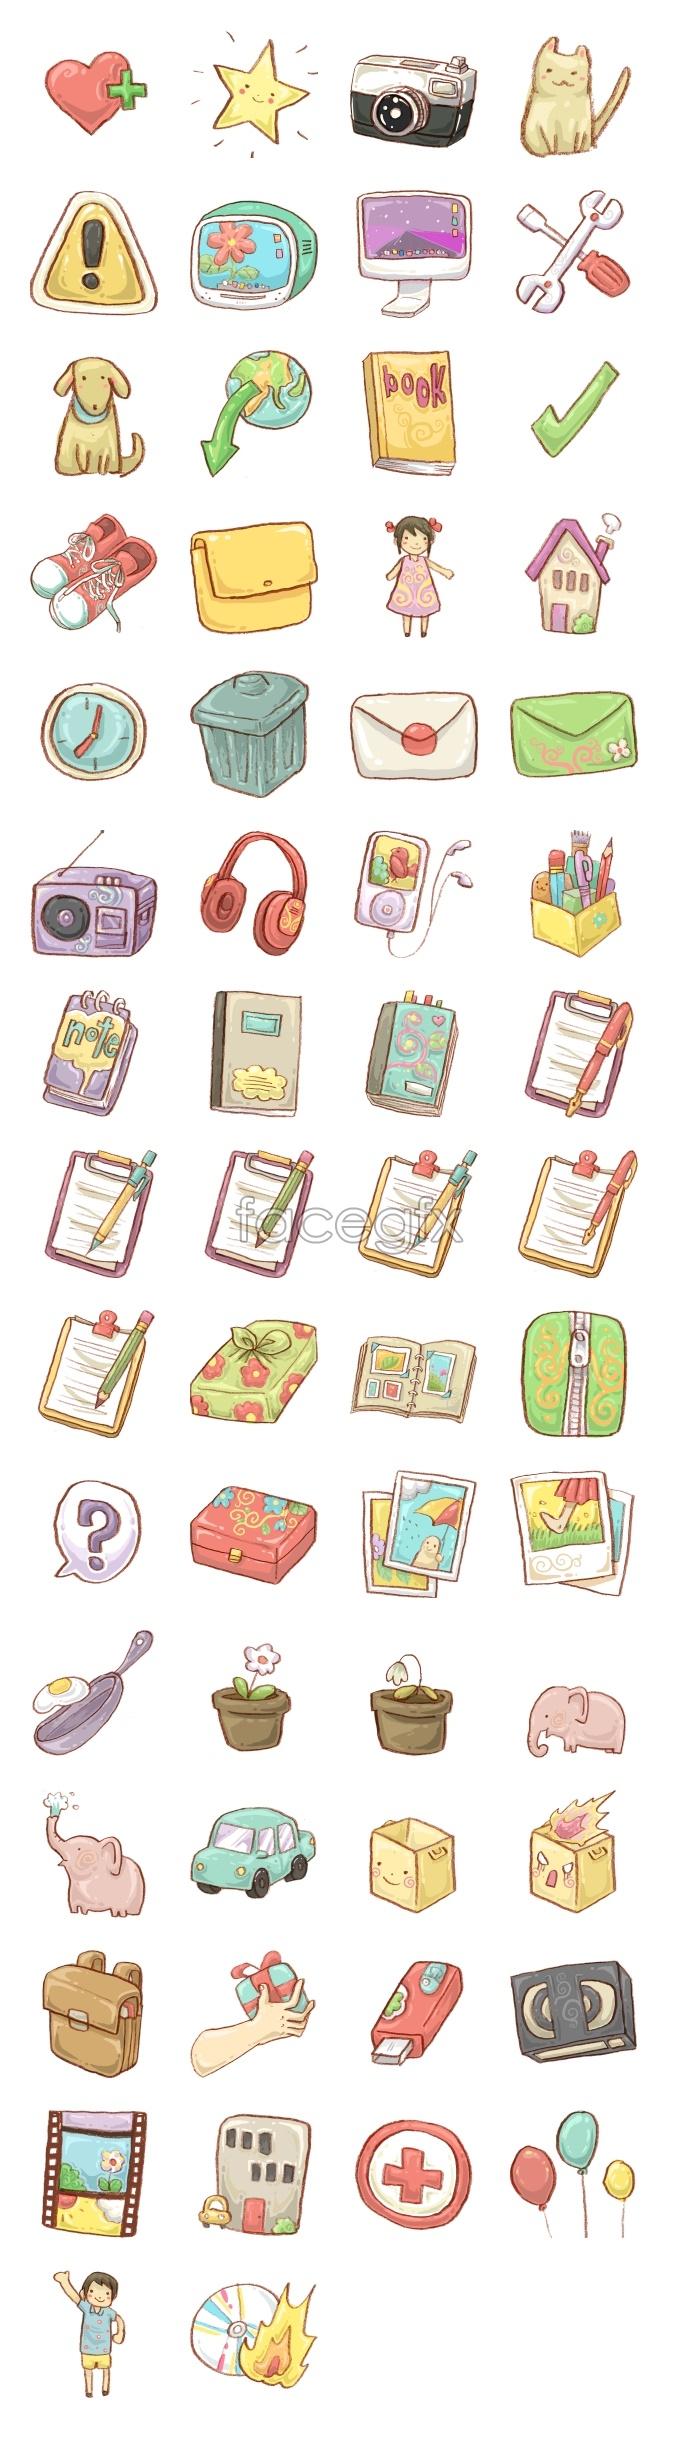 Cartoon life tools icon